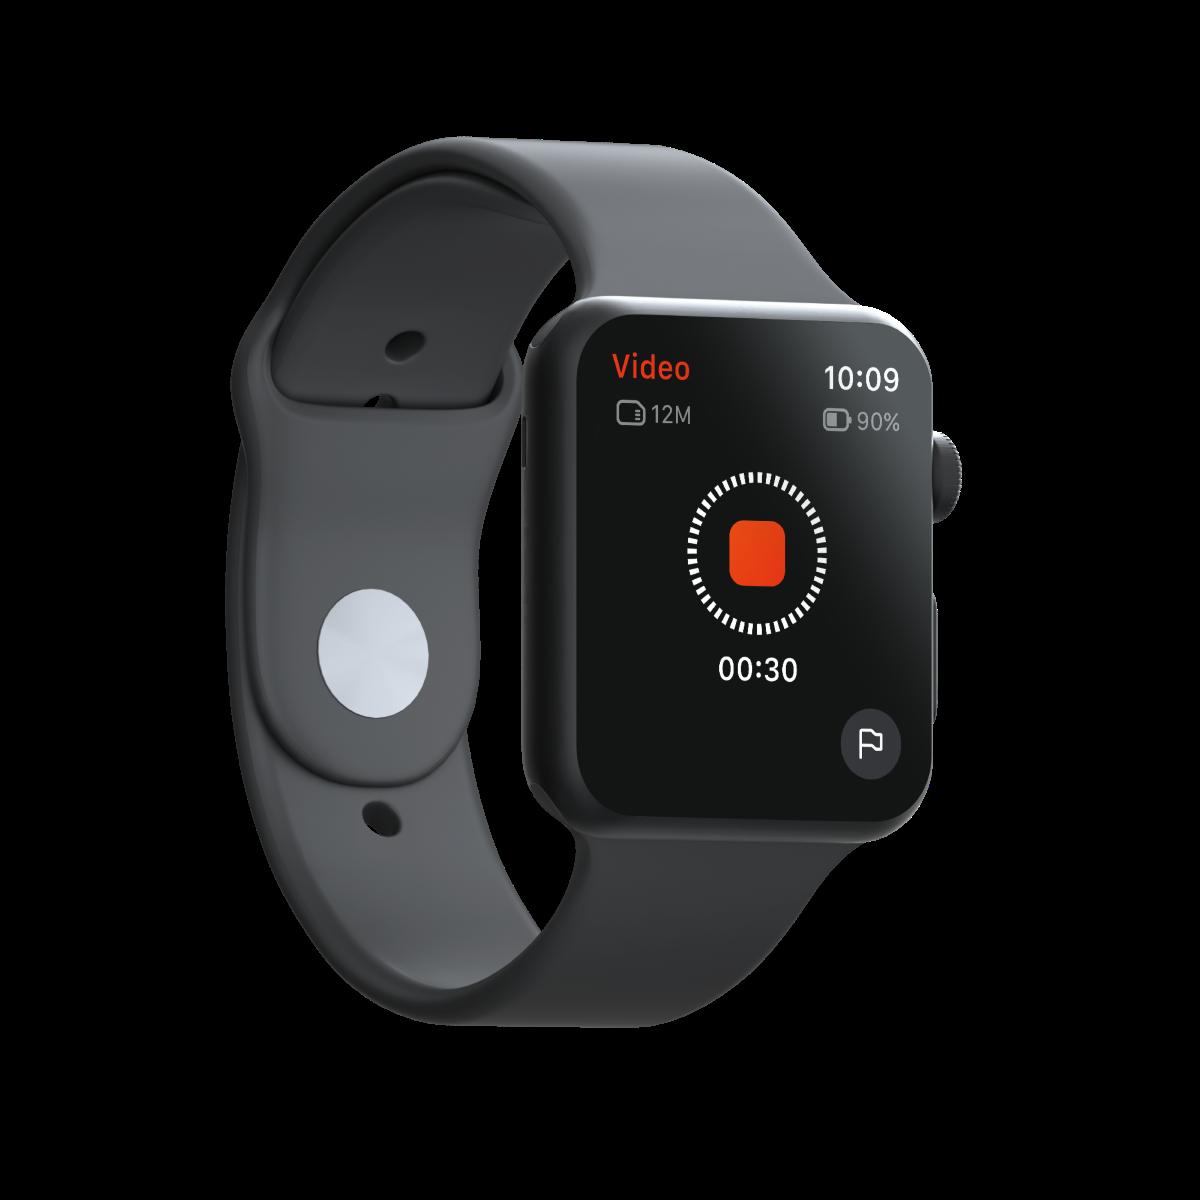 фото управления при помощи Apple Watch